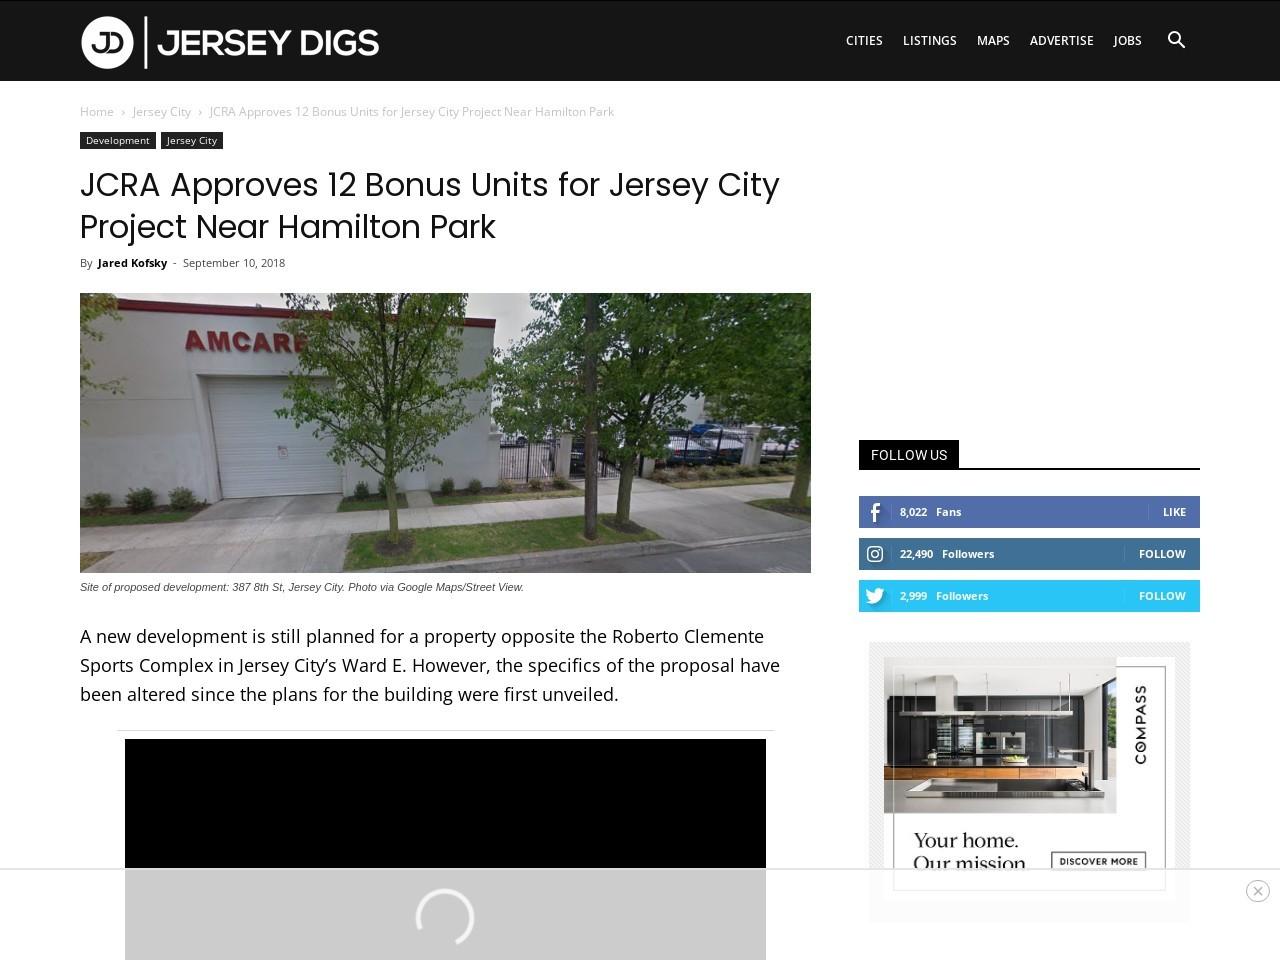 JCRA Approves 12 Bonus Units for Jersey City Project Near Hamilton Park